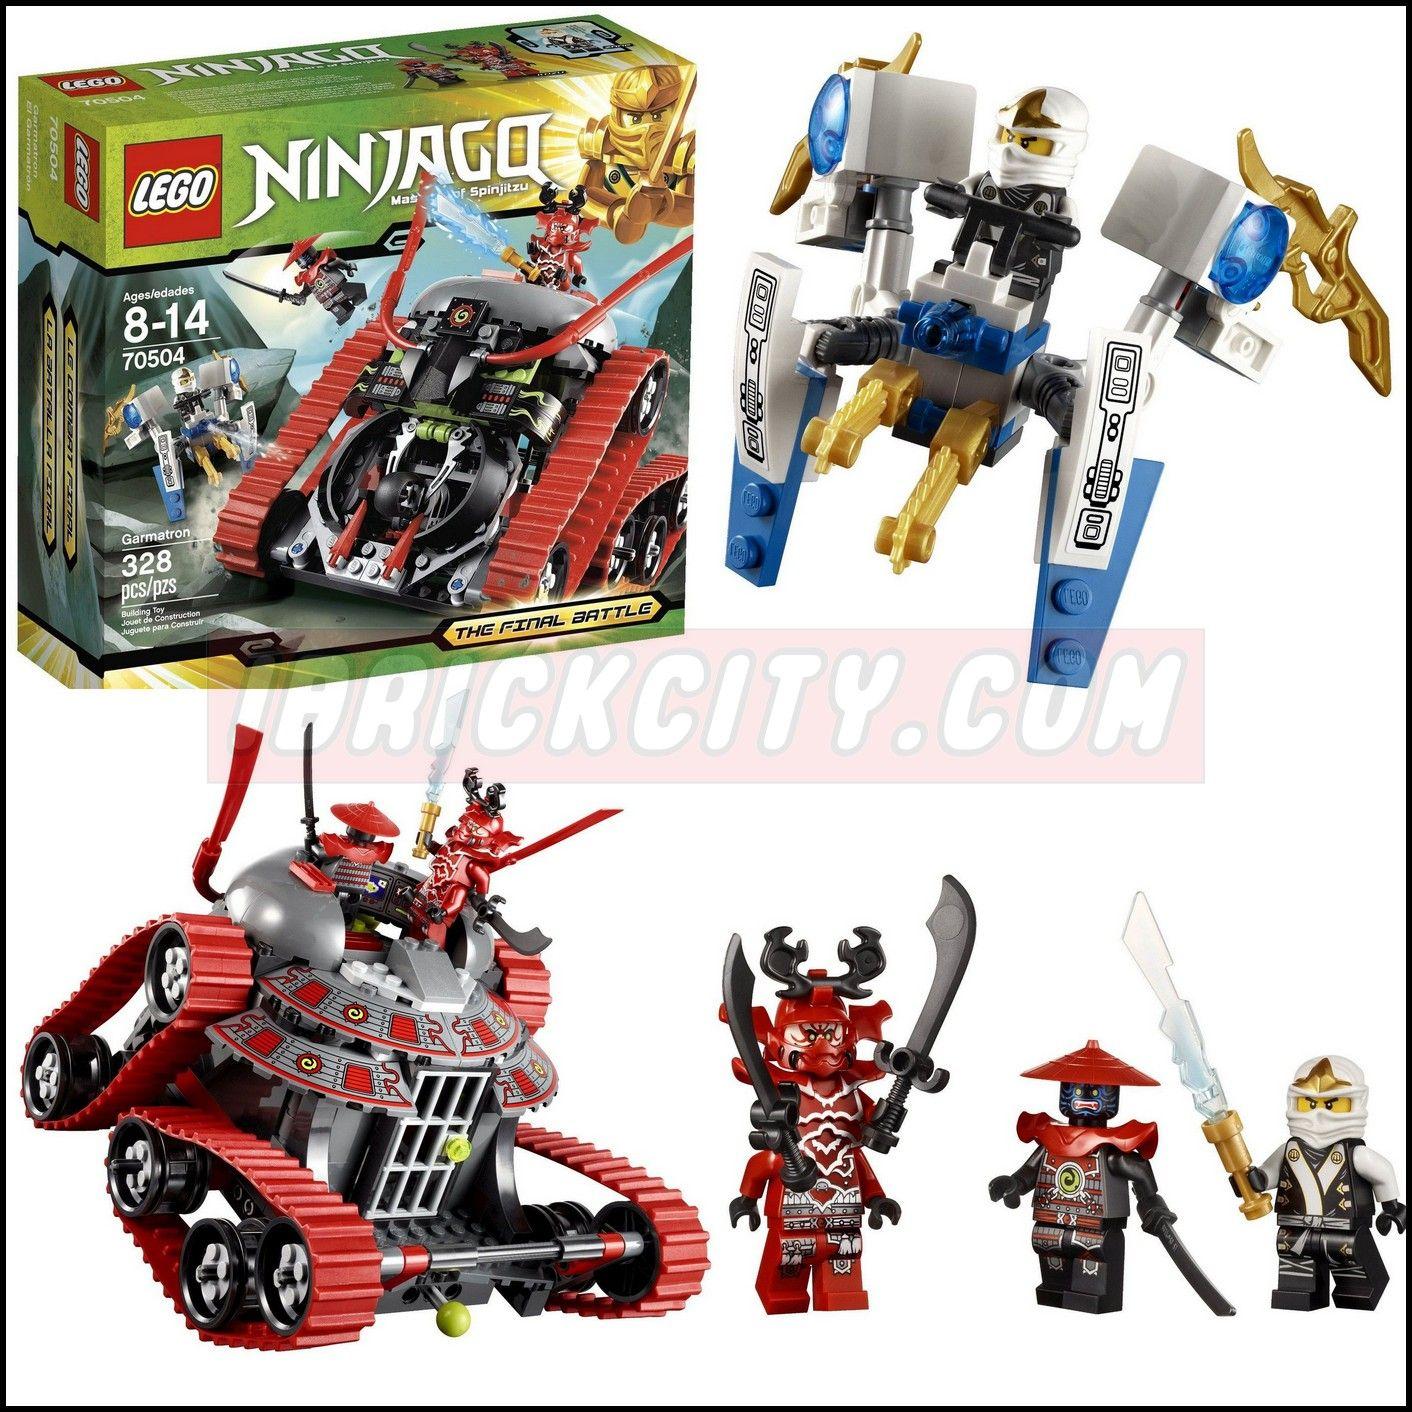 Lego 70504 Garmatron ninjago ibrickcity 27 1024x1024 Lego 70504